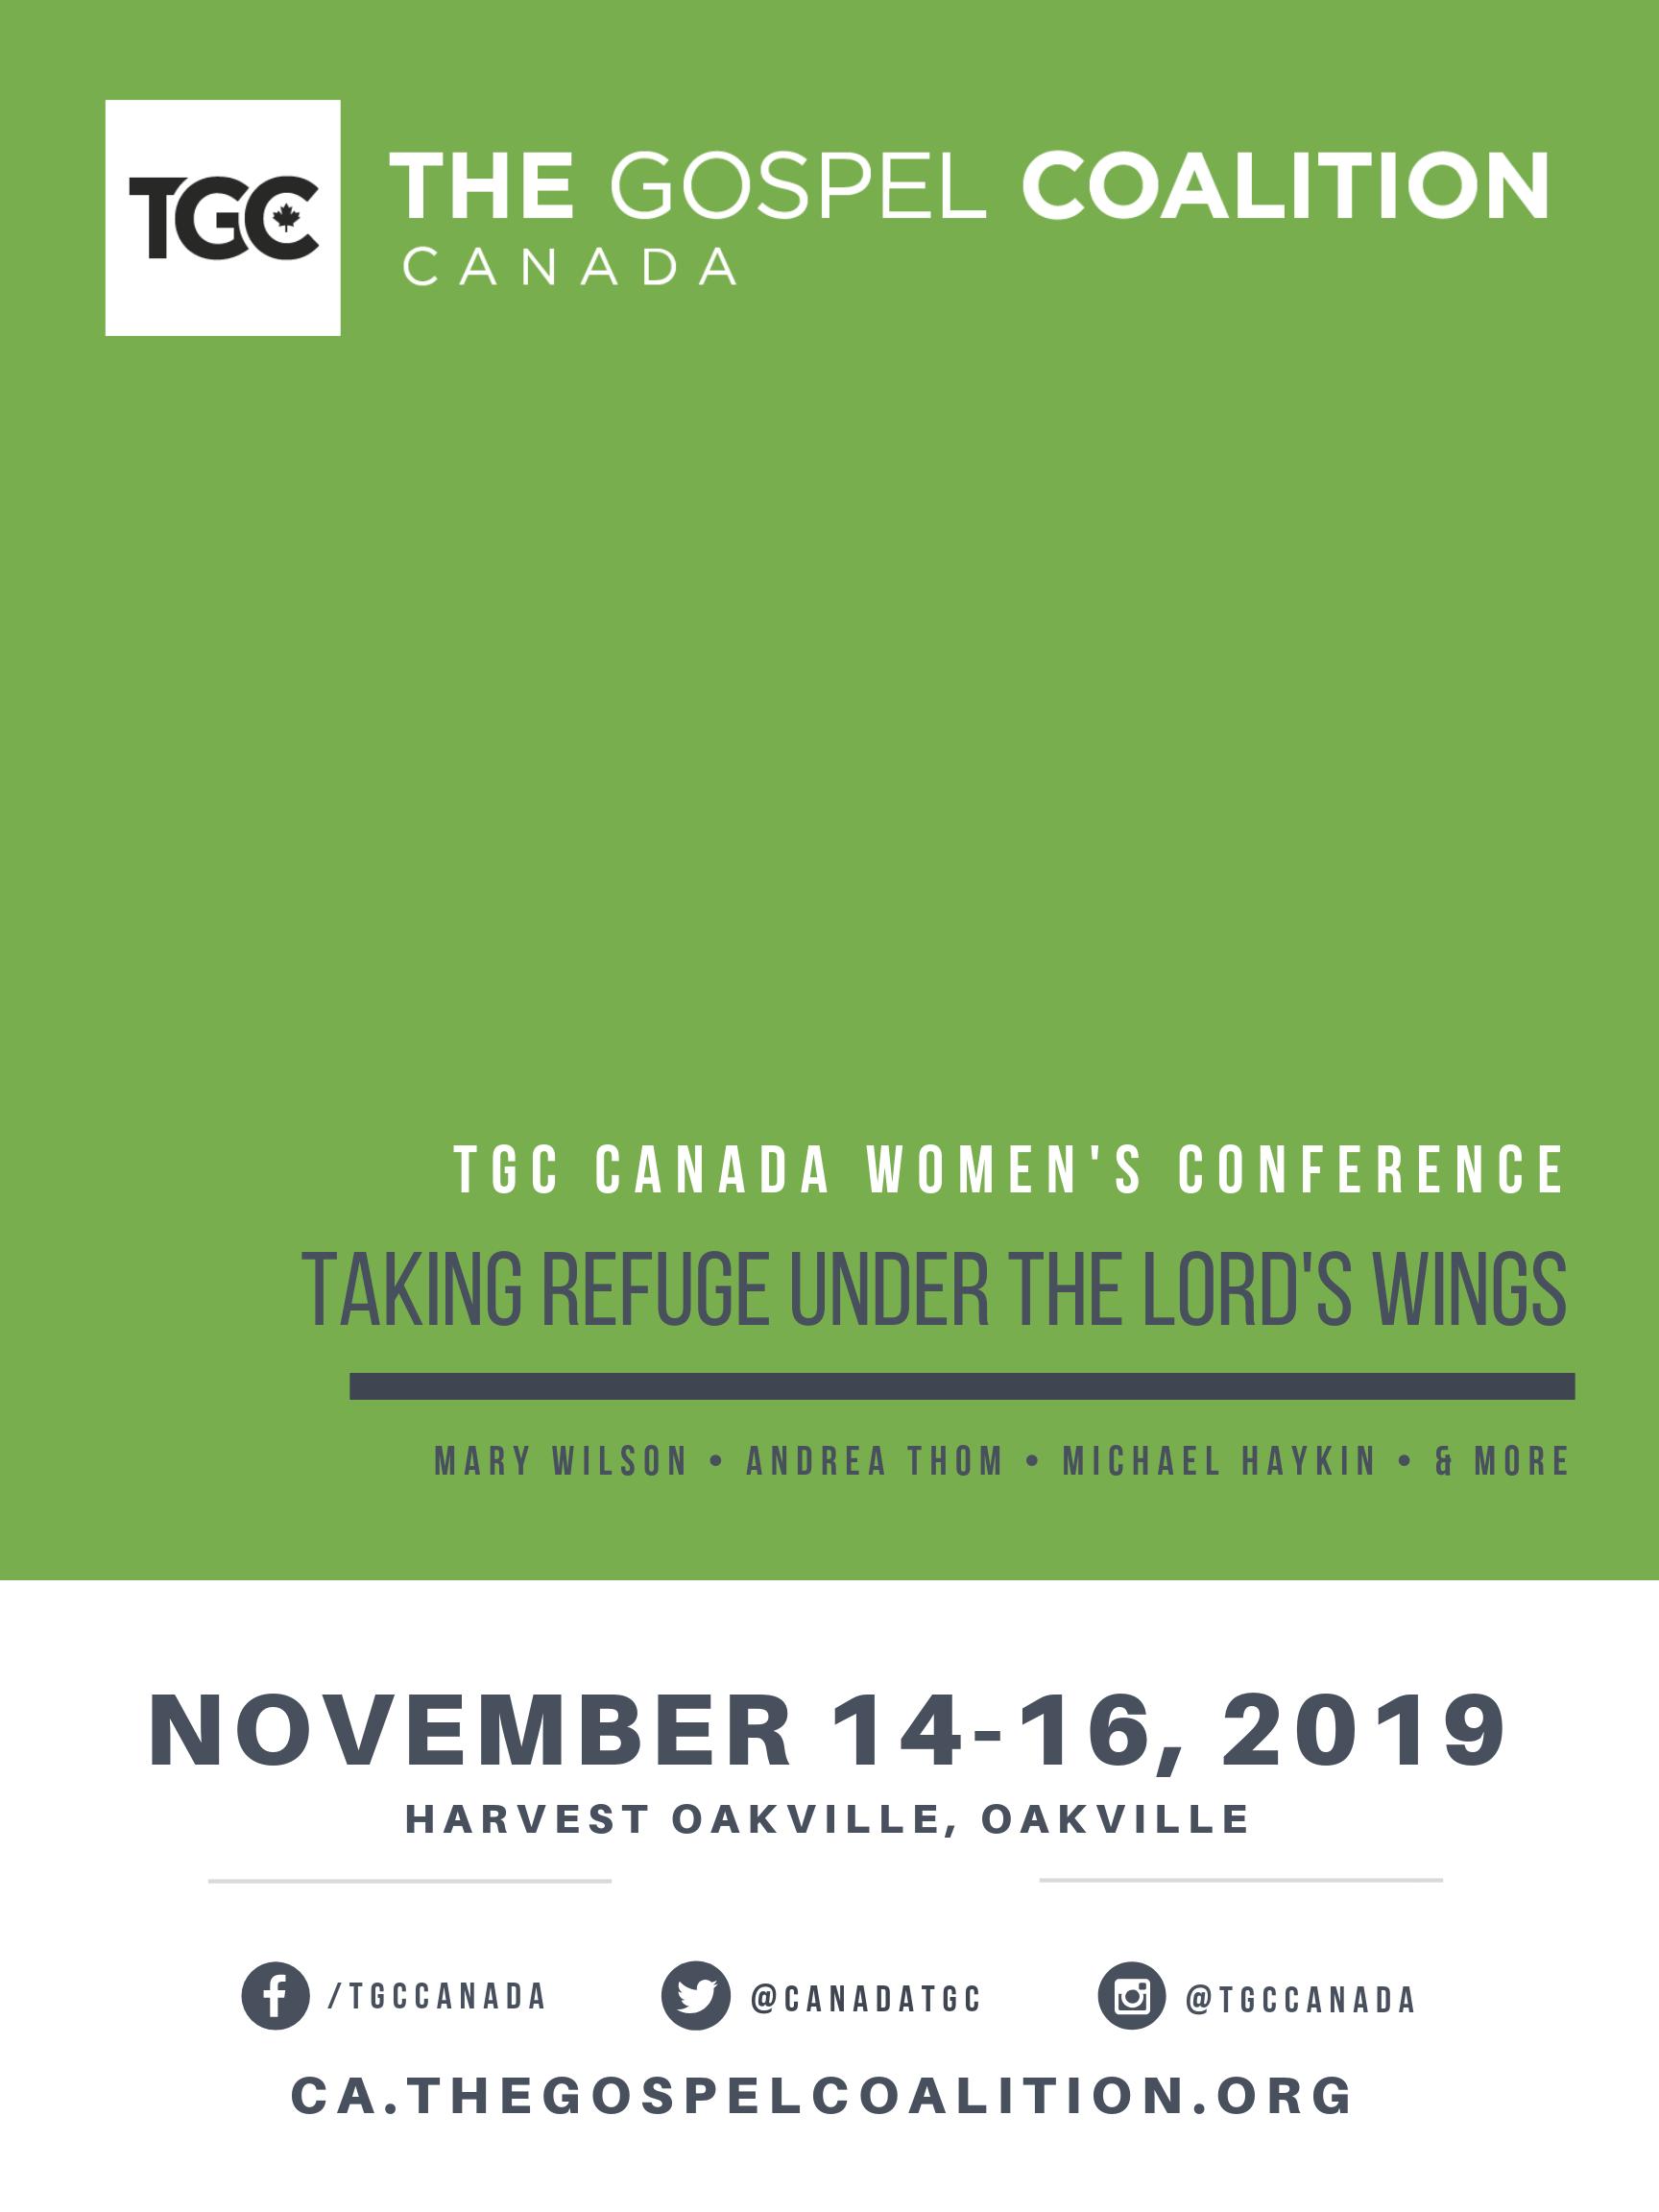 TGC Canada Women's Conference 2019 - The Gospel Coalition